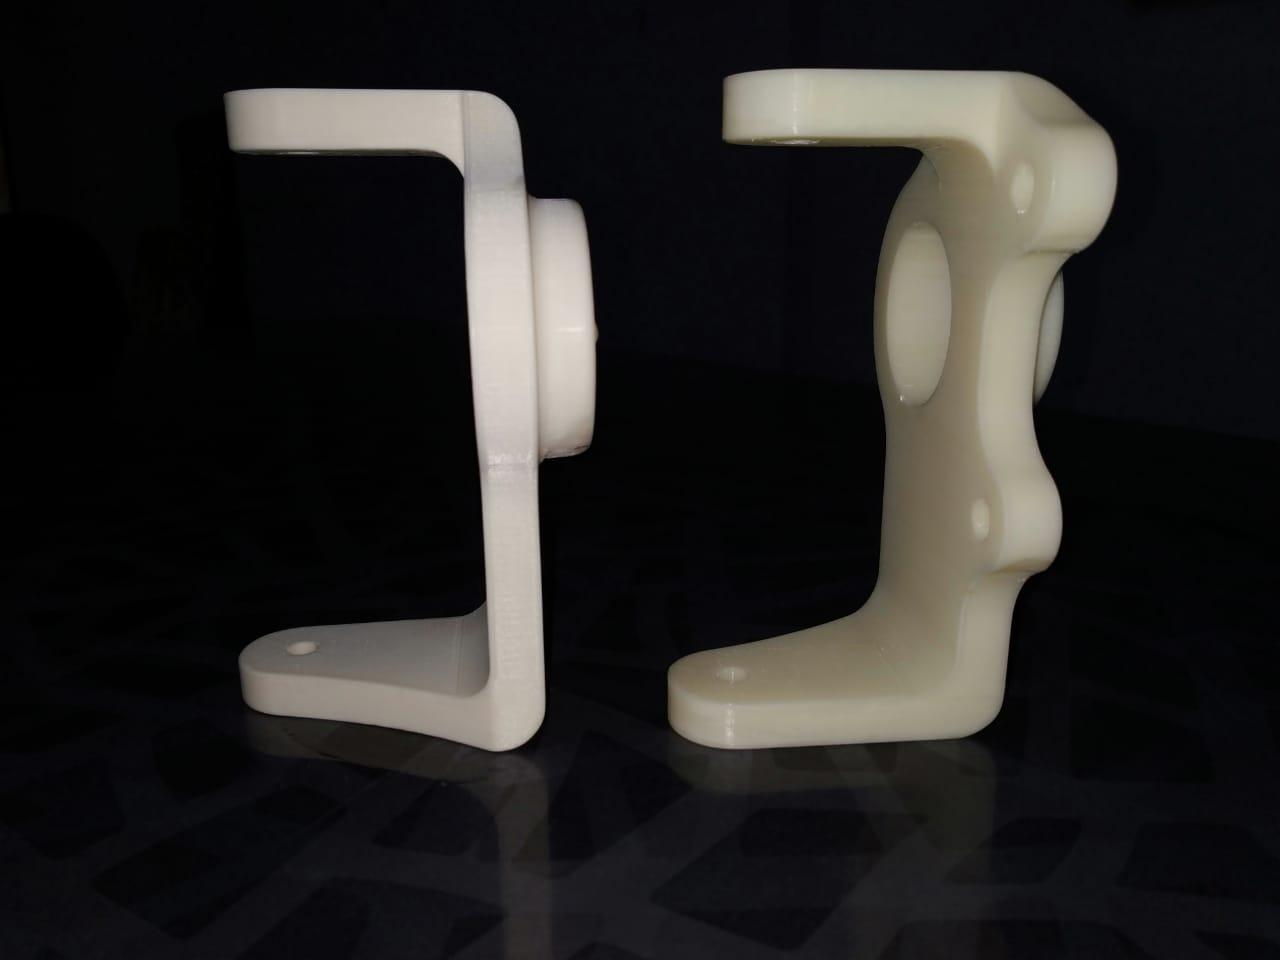 3D Printed Designifying